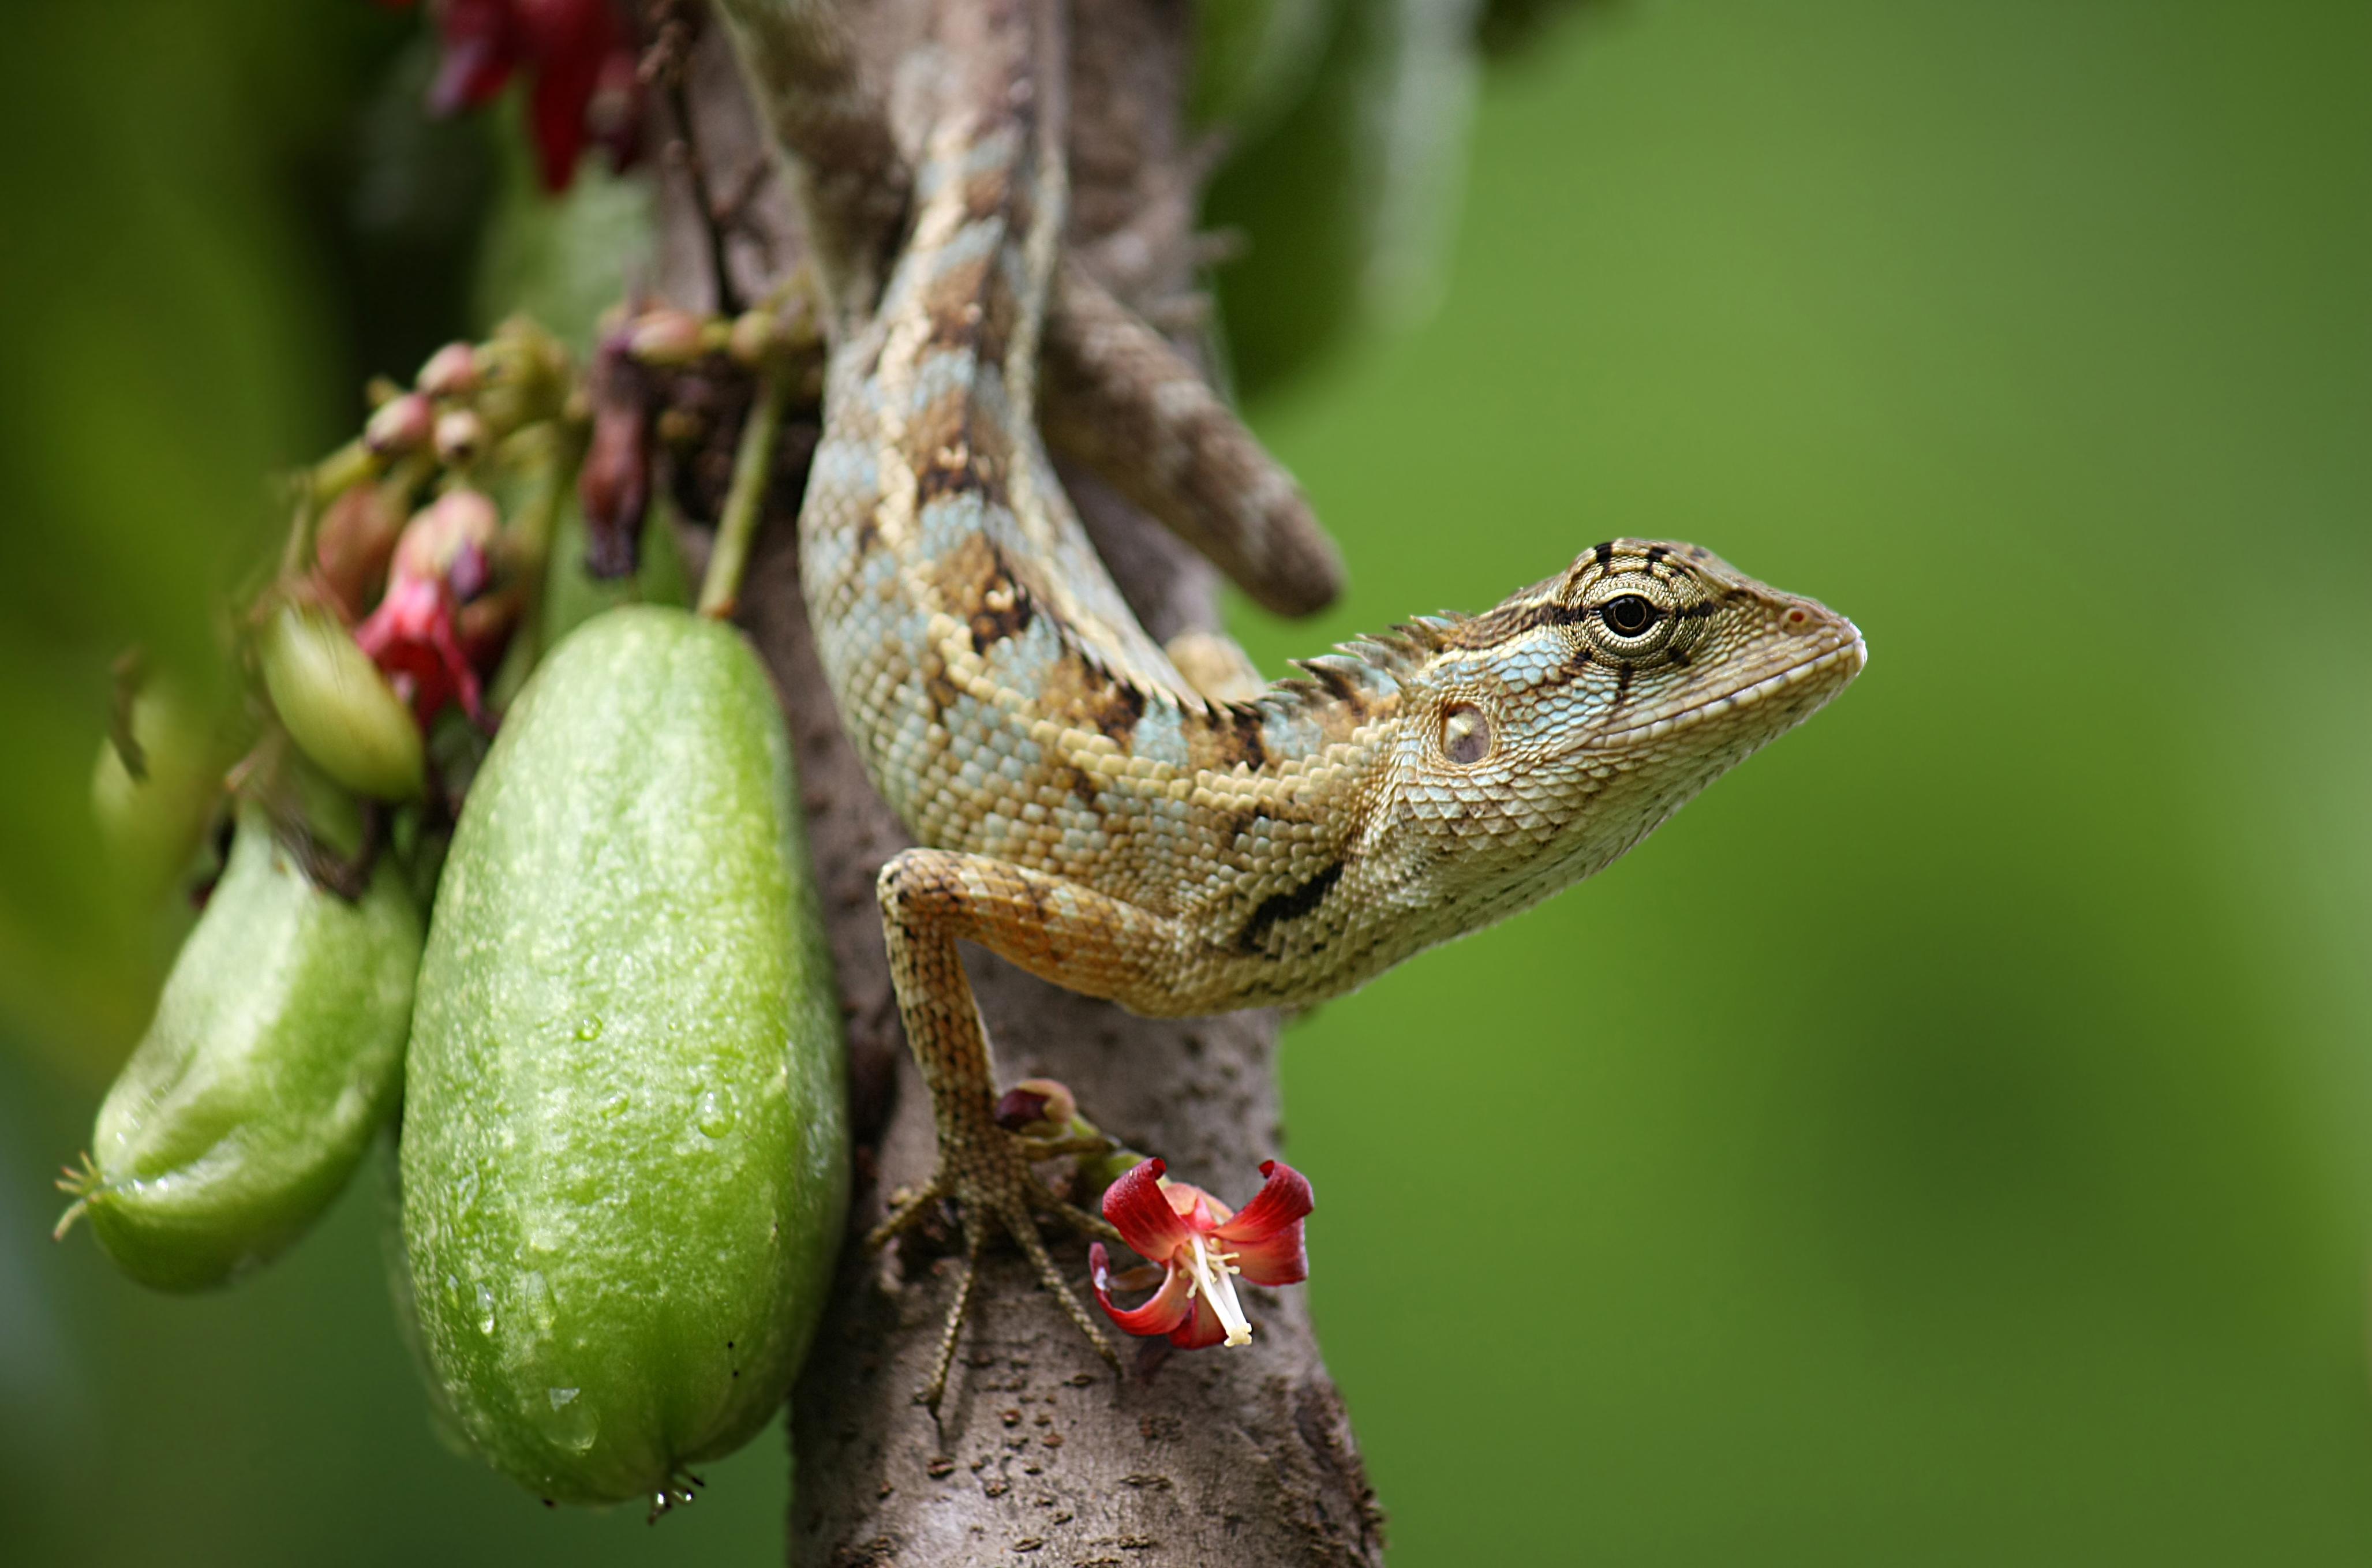 fileoriental garden lizard calotes versicolorjpg - Garden Lizard